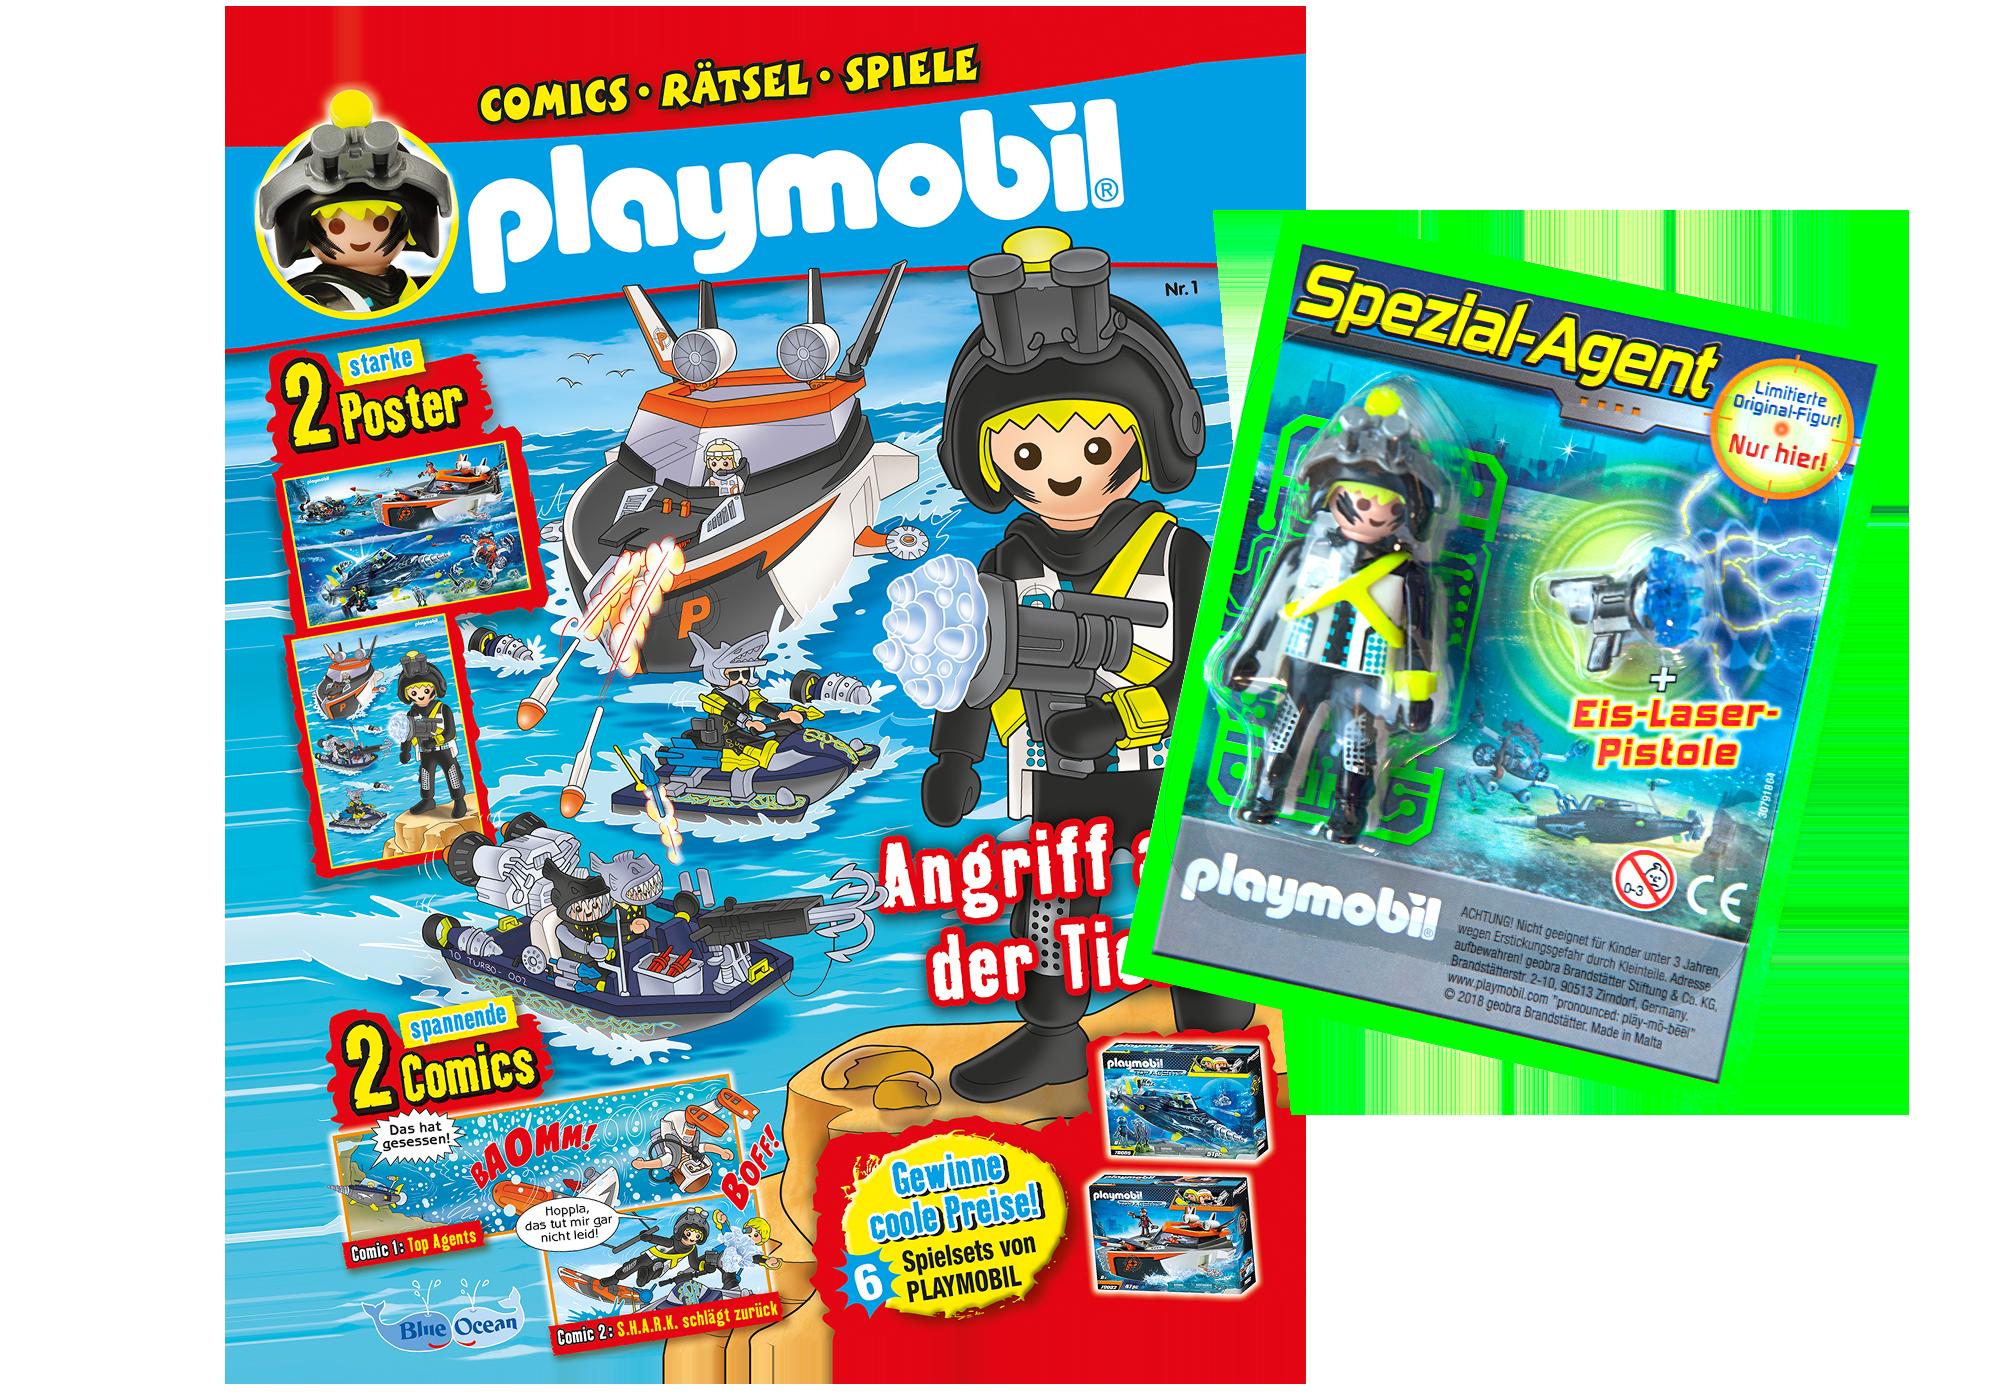 http://media.playmobil.com/i/playmobil/80618_product_detail/PLAYMOBIL-Magazin 1/2019 (Heft 67)